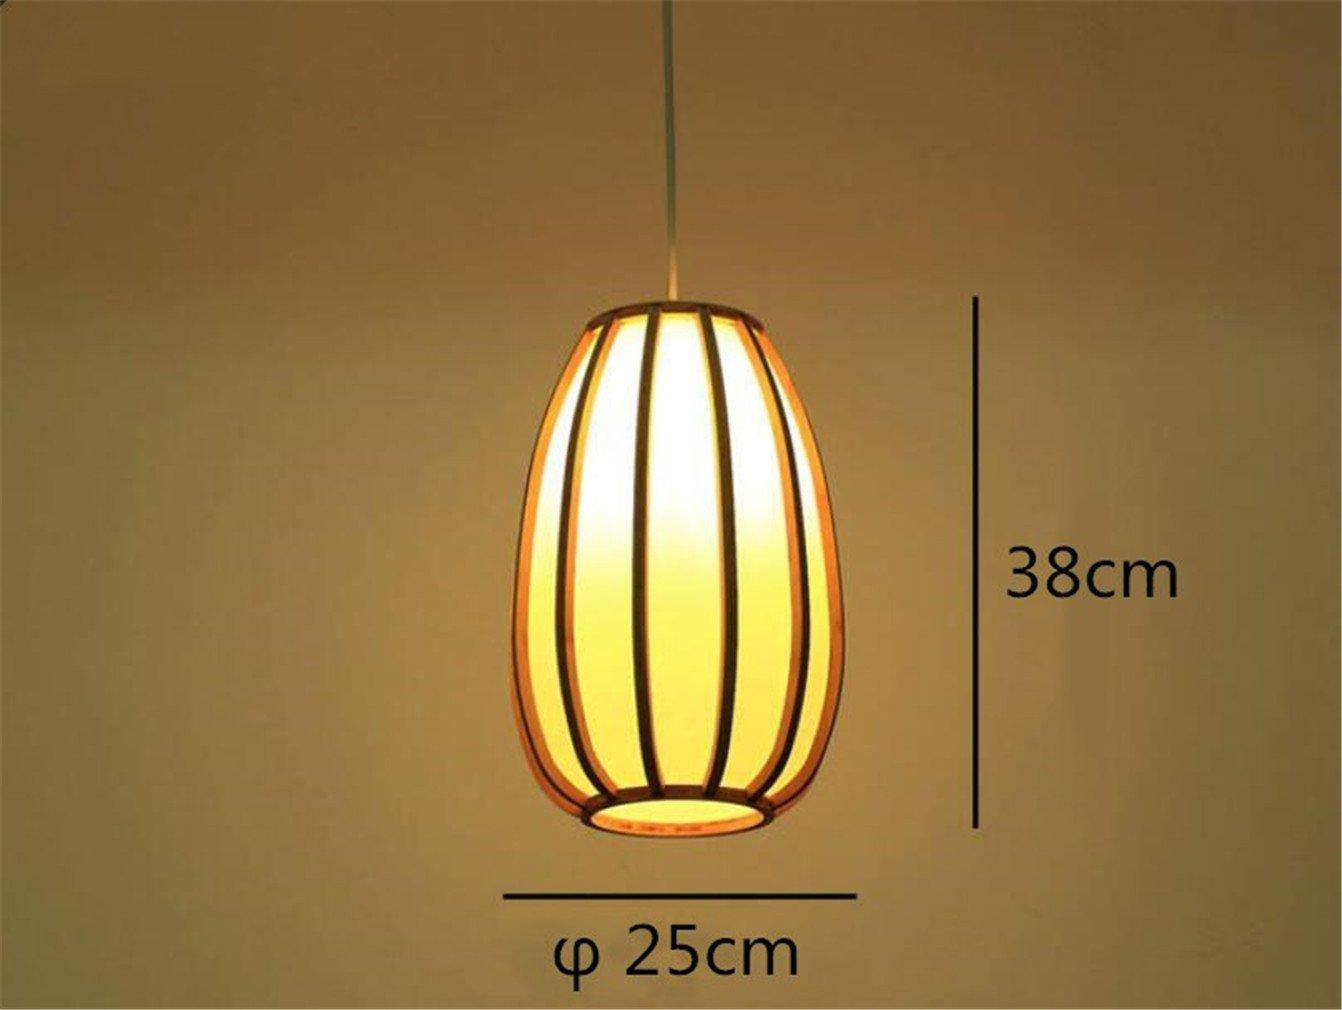 Plafoniera Vimini : Lampadario da parete lampada soffitto plafoniera rattan wood